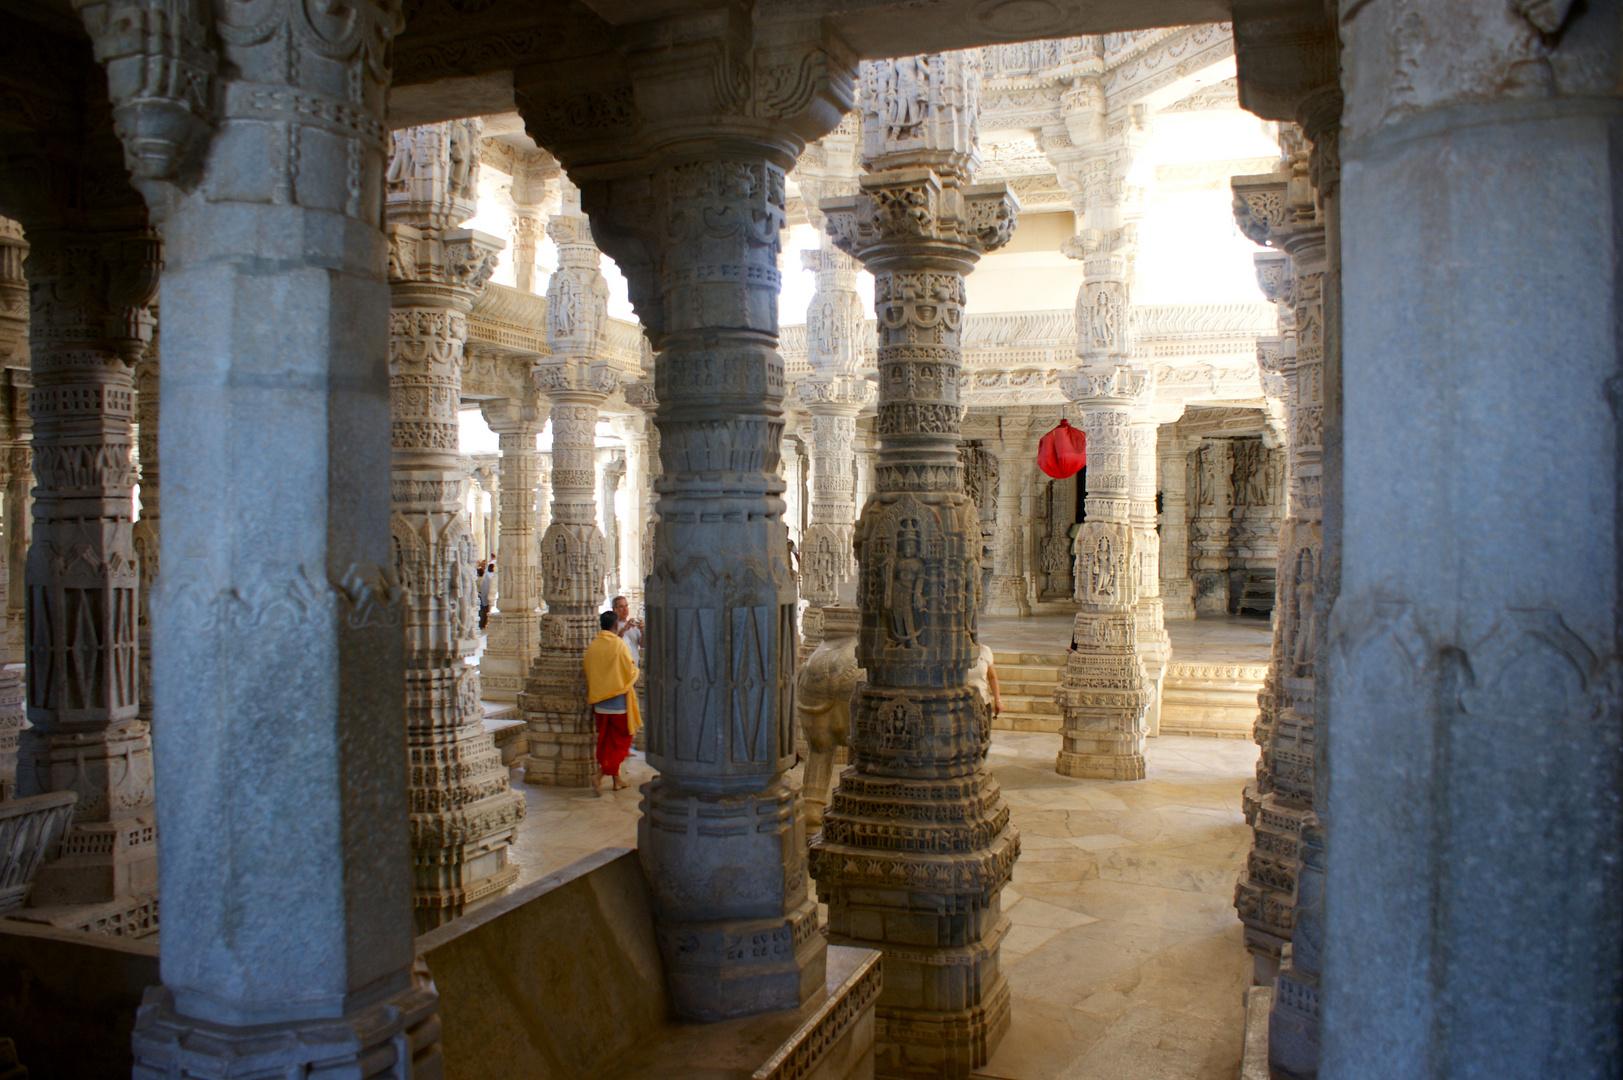 Columns inside the Adinath Temple, near Udaipur